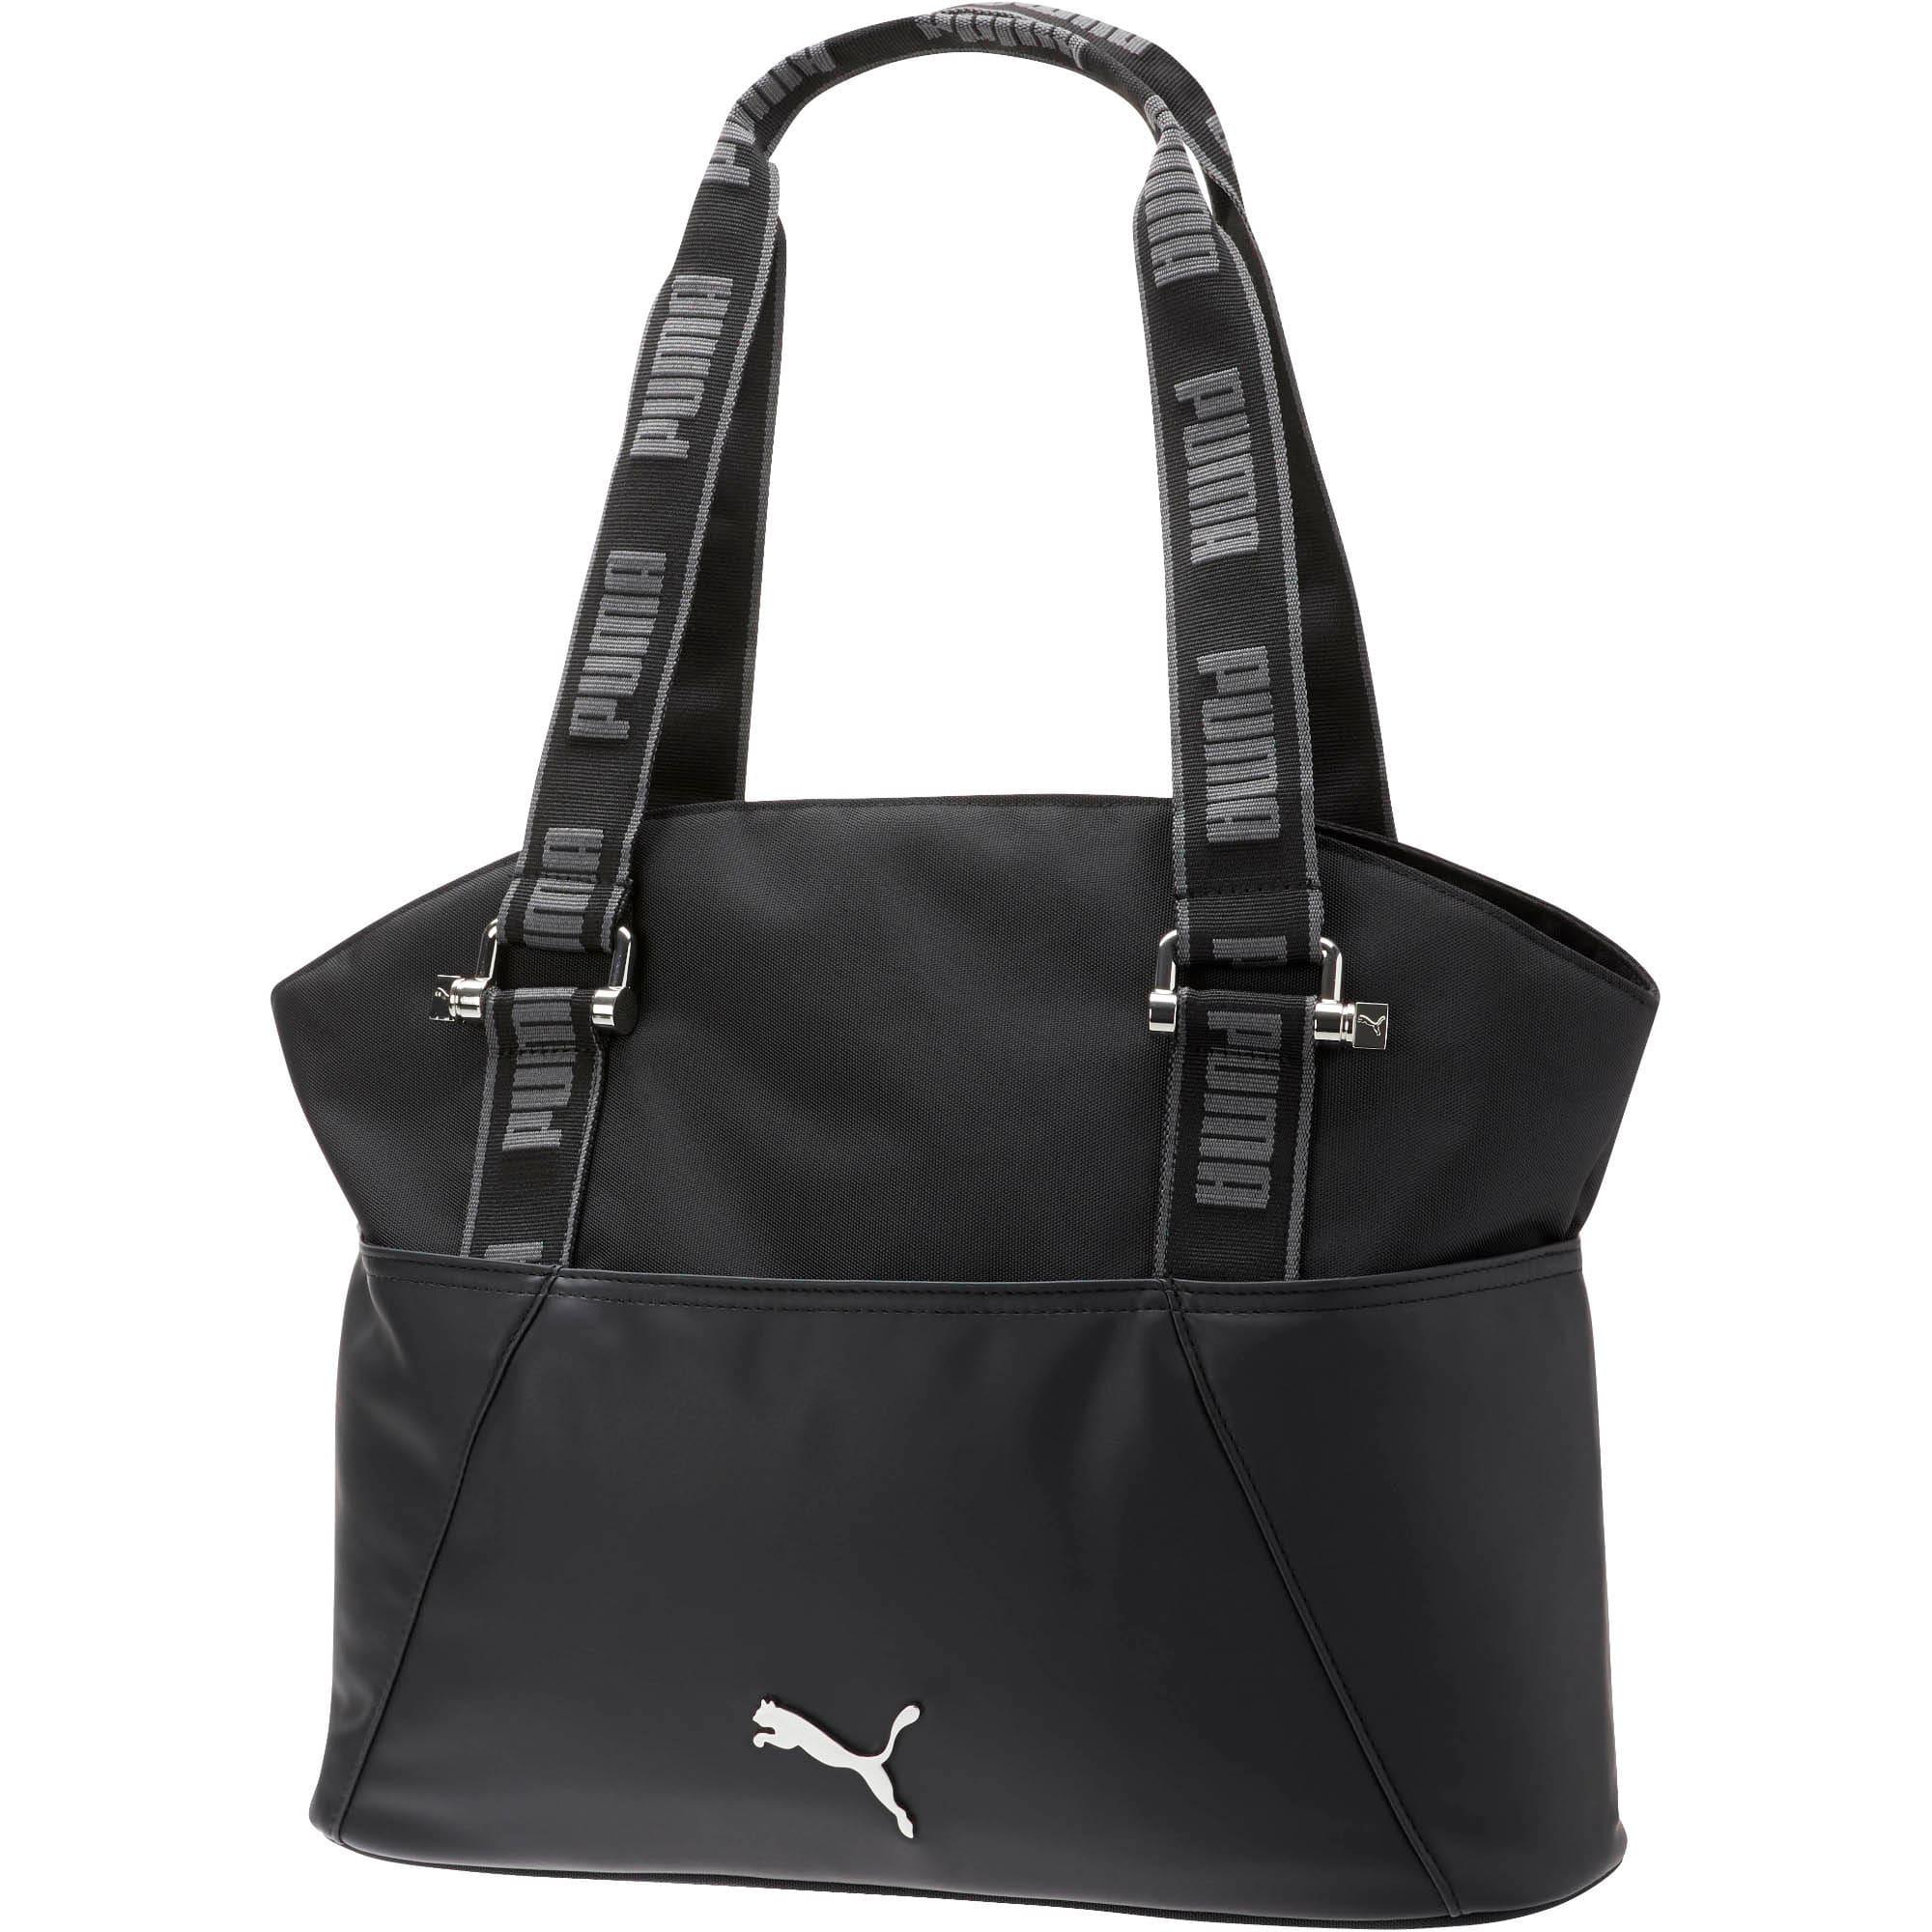 Thumbnail 1 of Marnie Tote Bag, Black Grey, medium